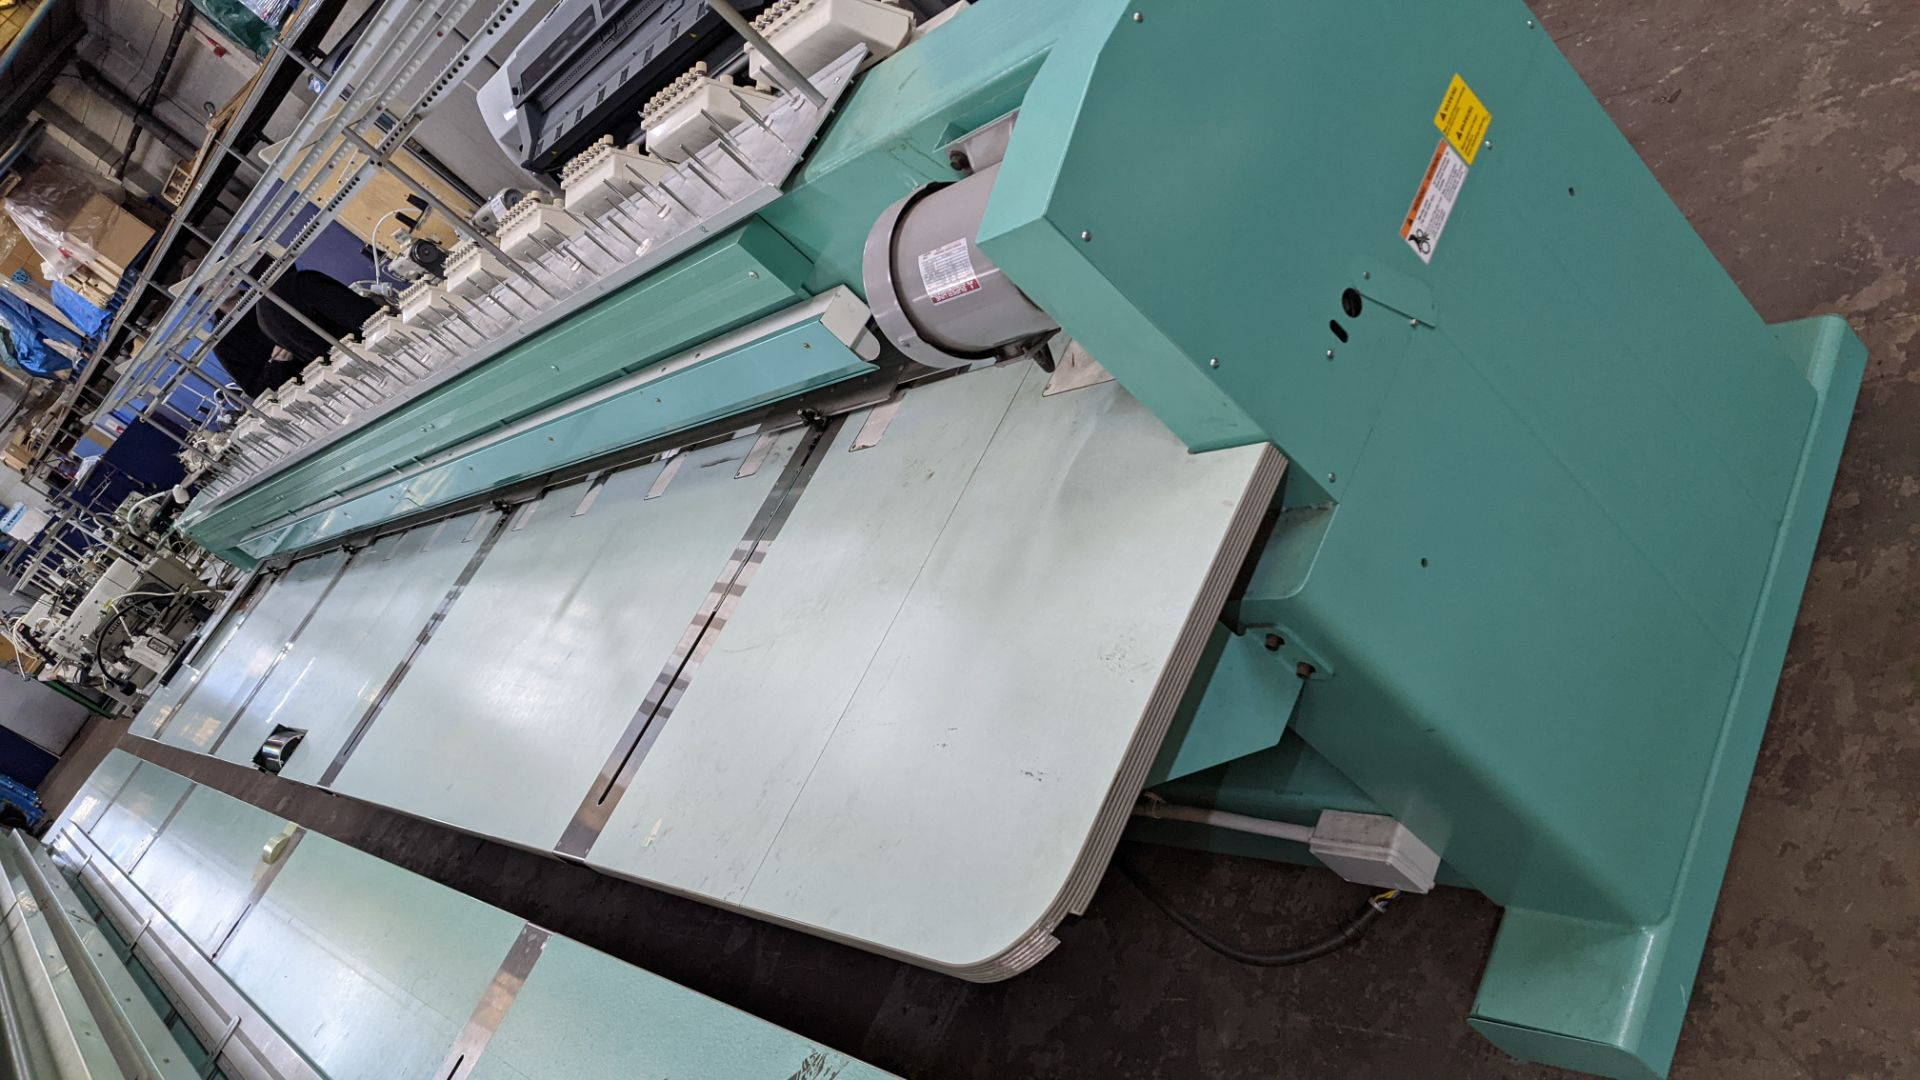 Tokai Tajima model TMFD-C912 electronic 12 head embroidery machine, type 2-2FX - Image 22 of 27